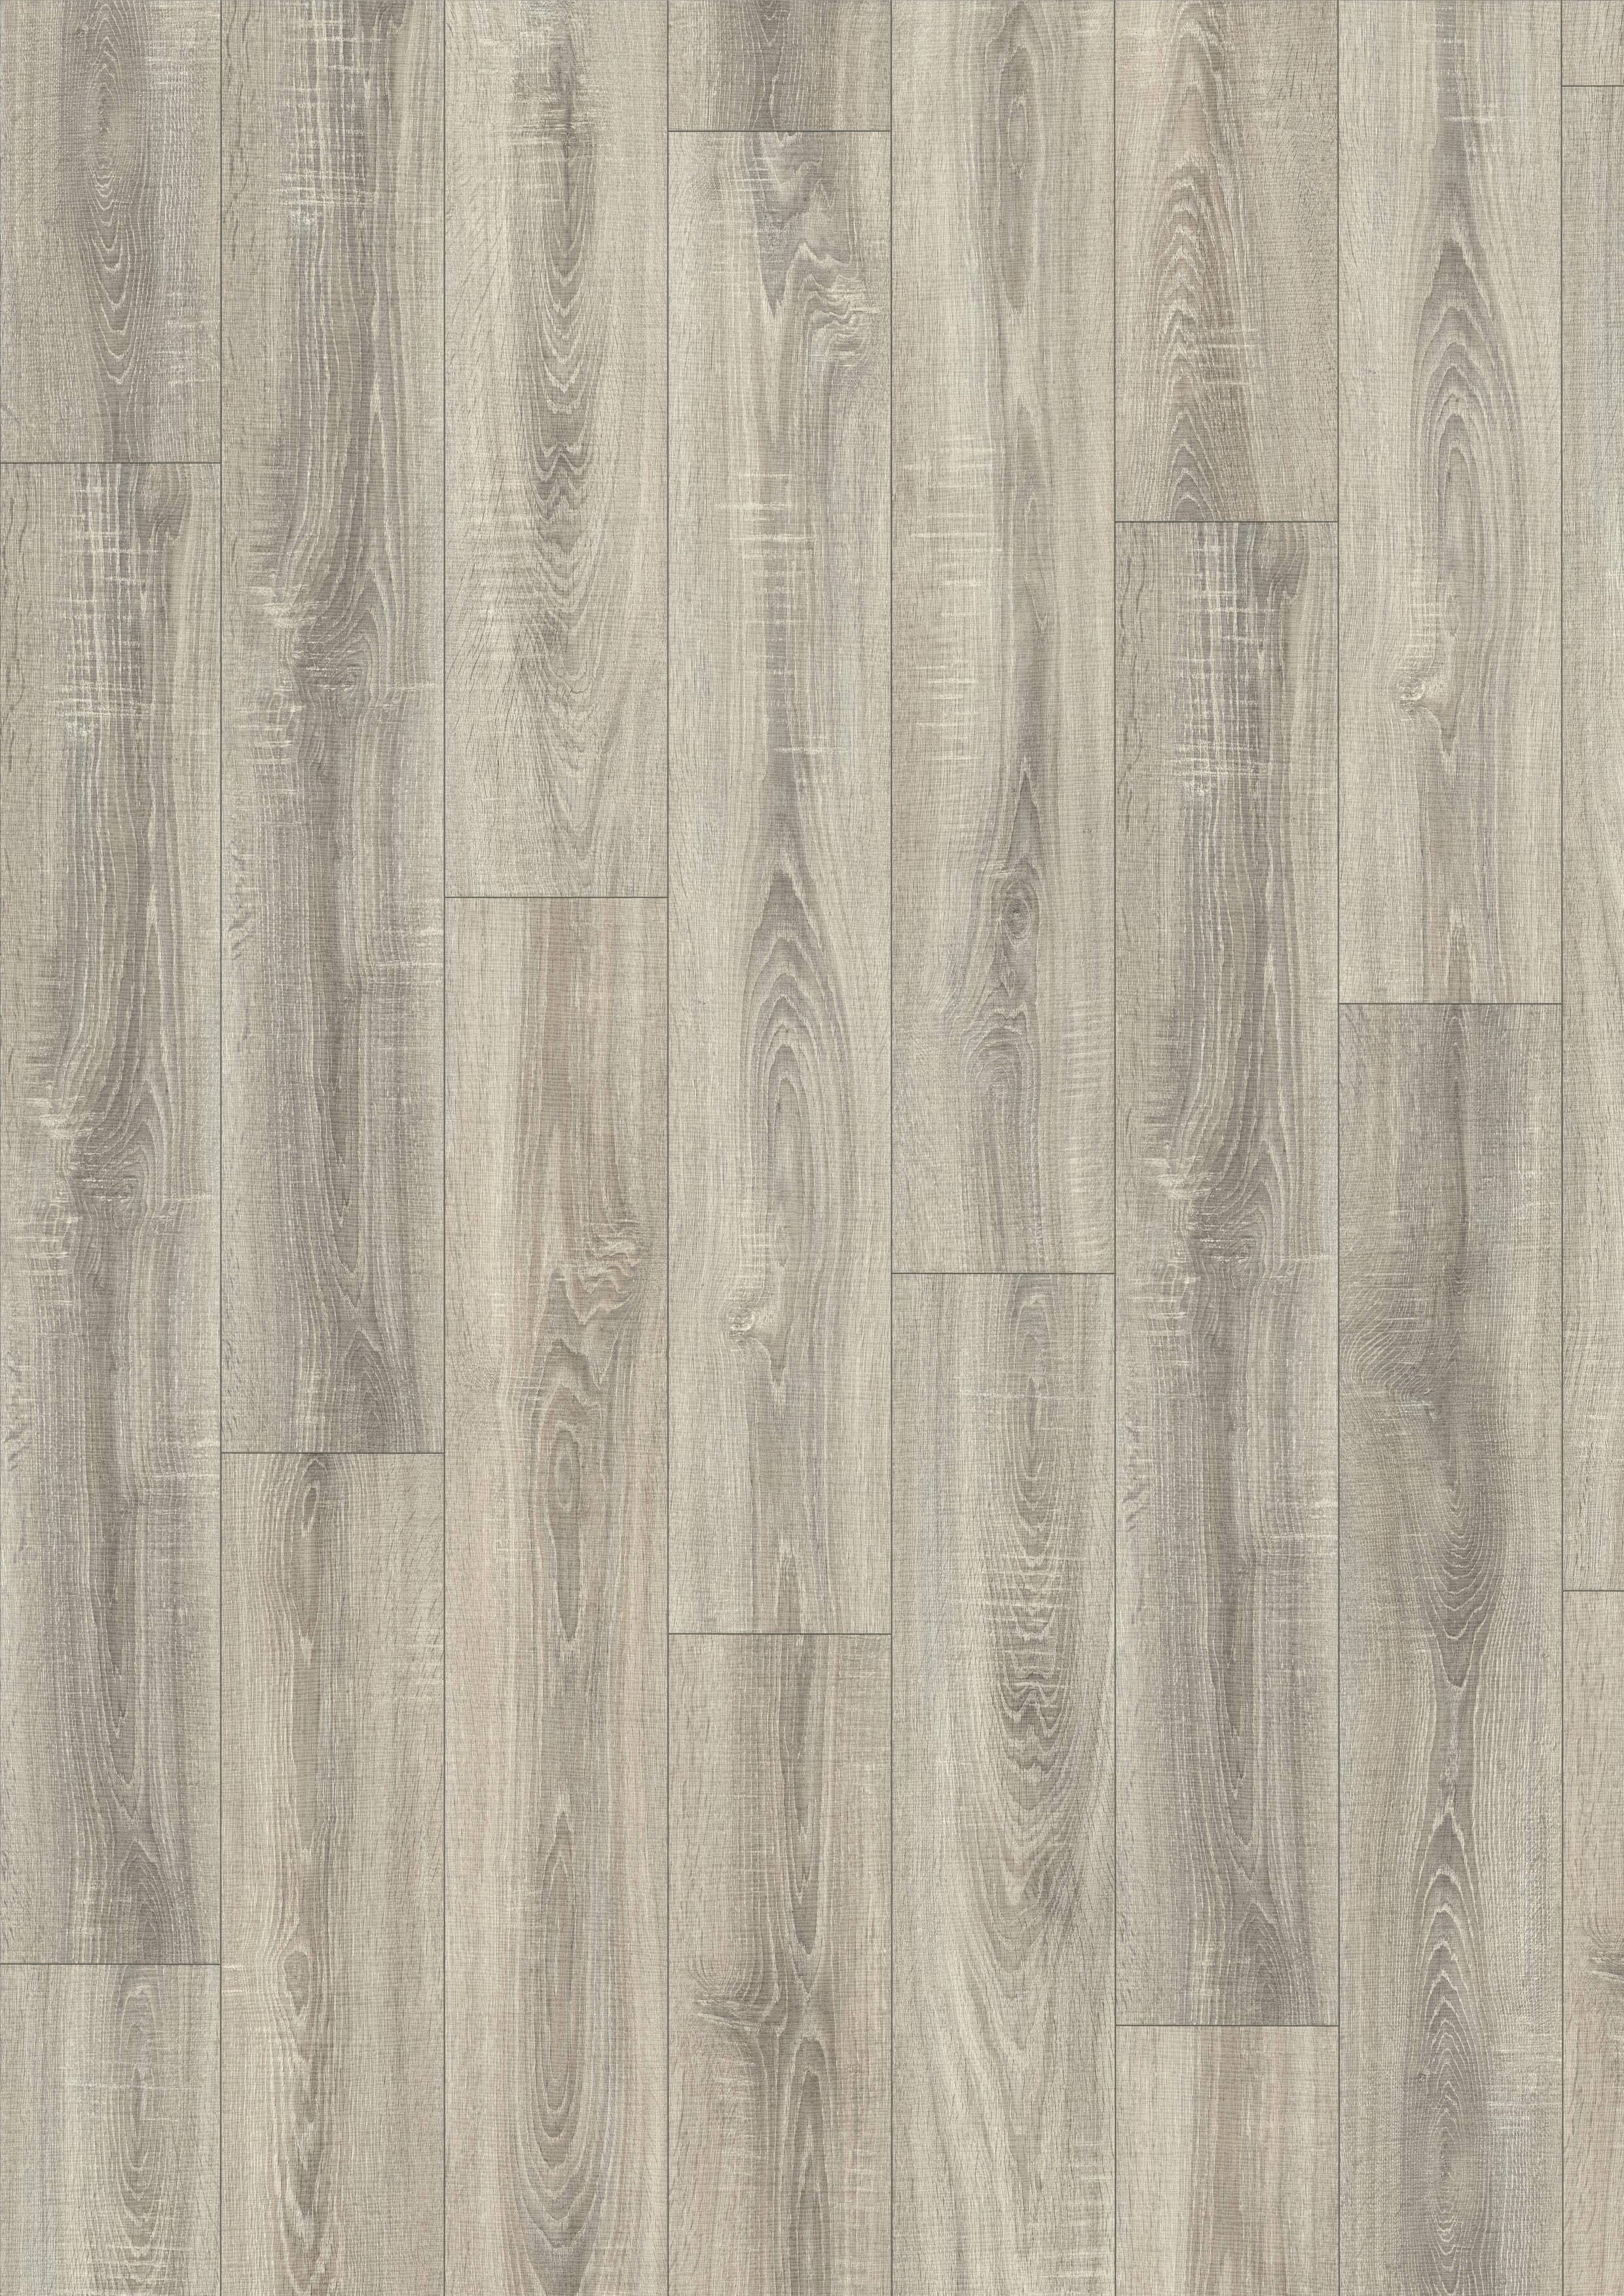 4804 - Oak Rift grey 1-Stab